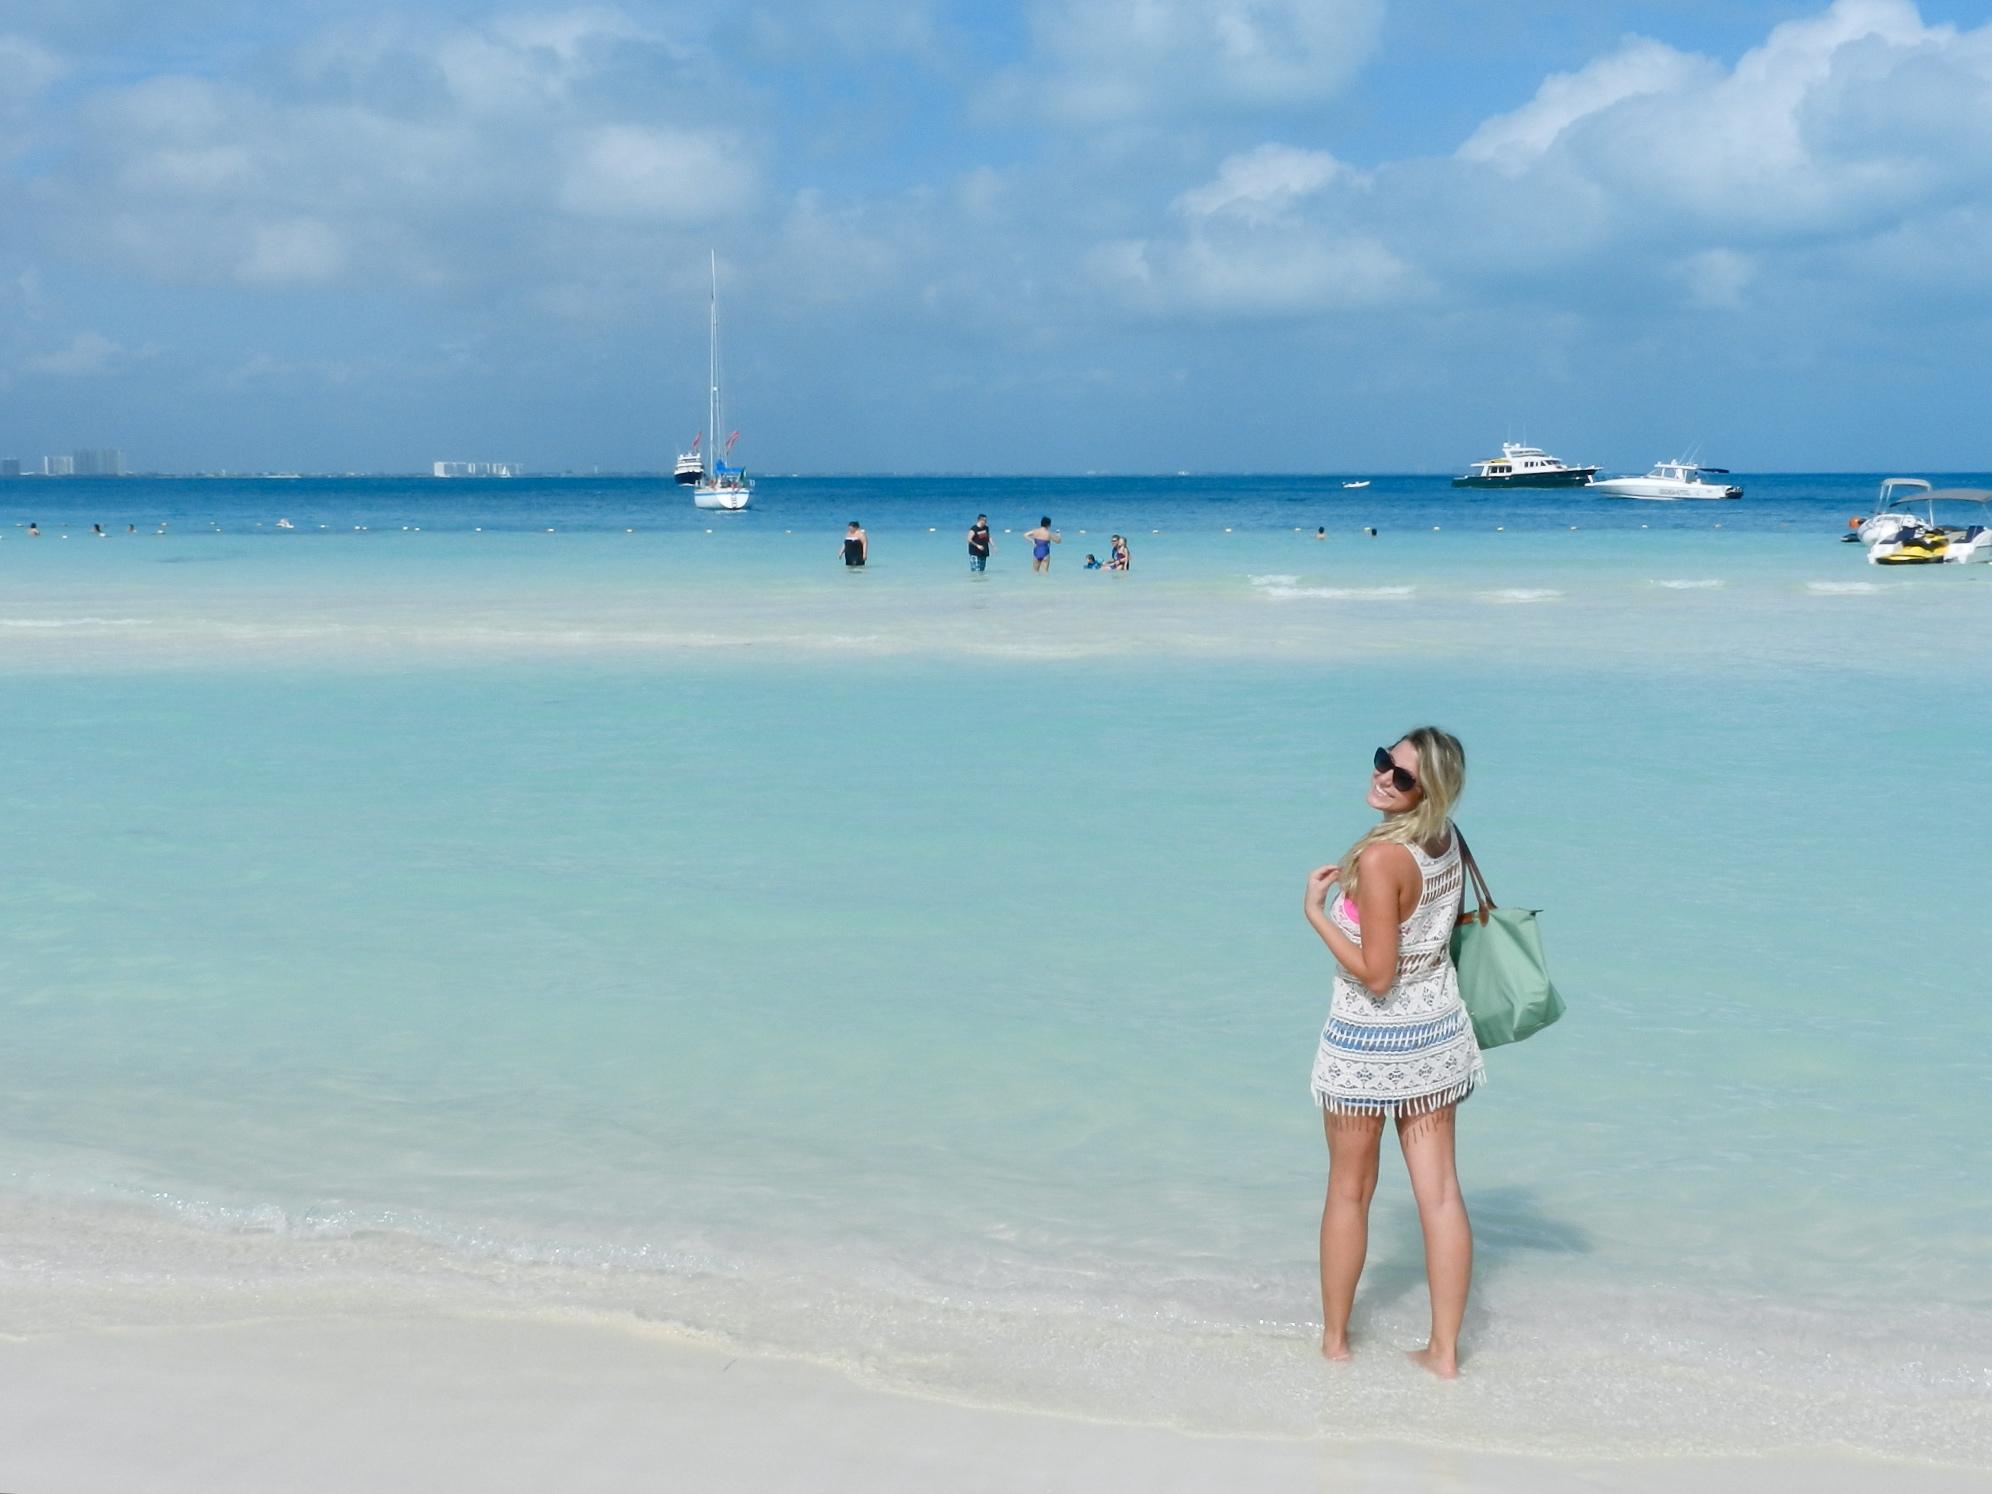 Muito azul turquesa pelas praias de Cancún, no México ♥